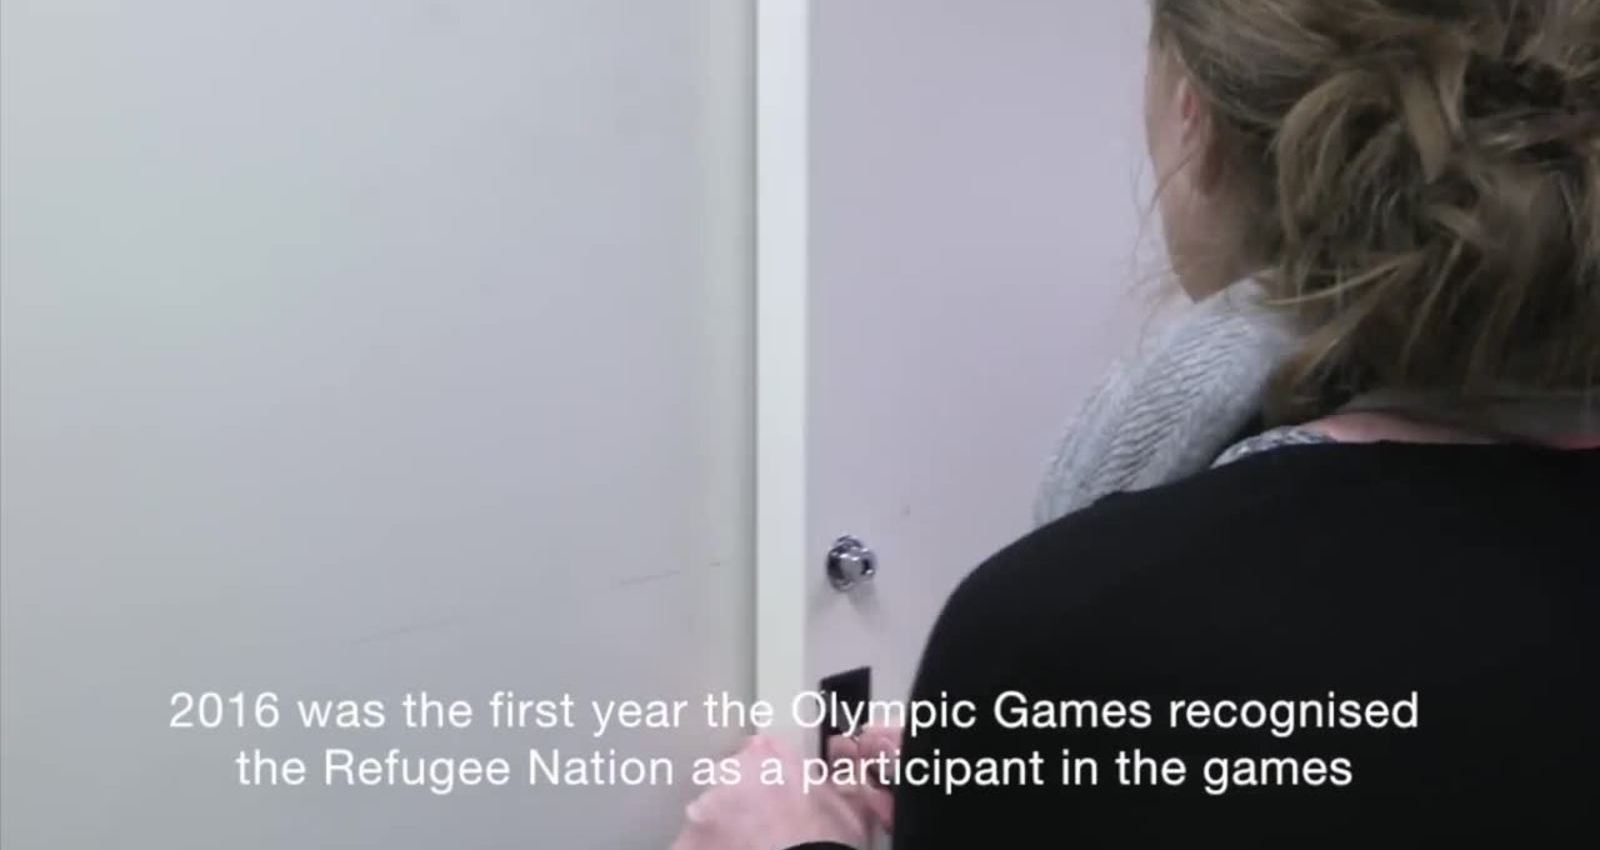 The Refugee Nation